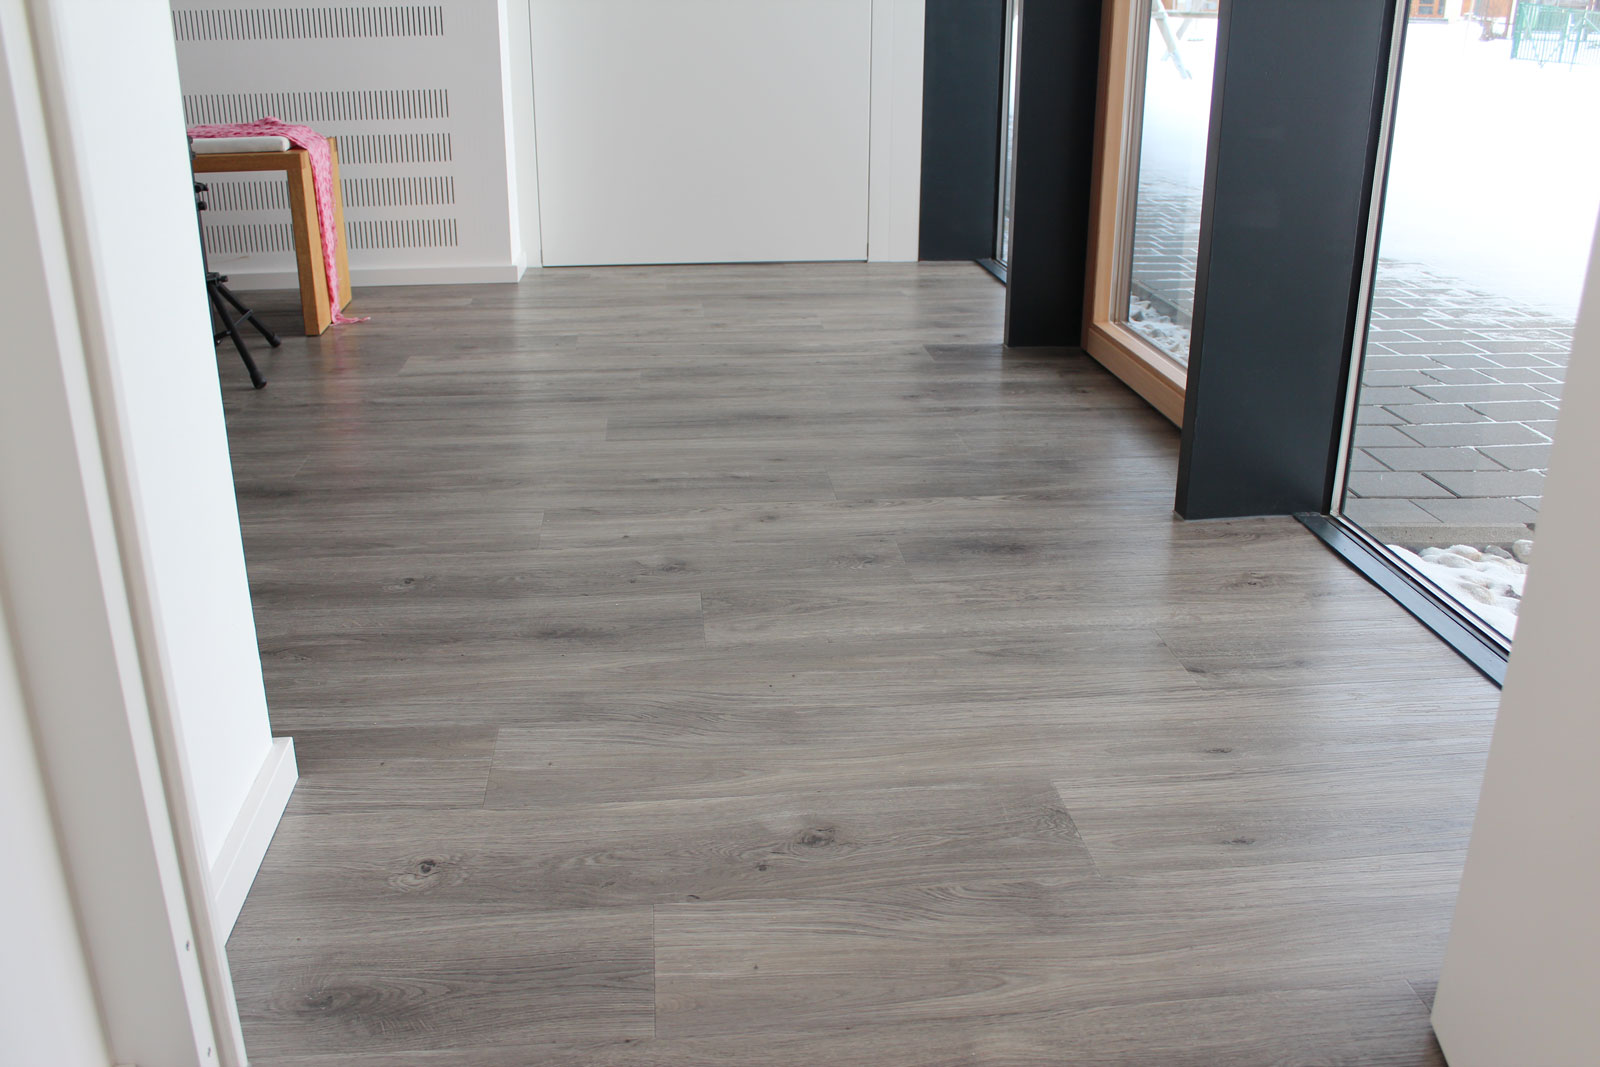 b den franz schobesberger st konrad franz schobesberger. Black Bedroom Furniture Sets. Home Design Ideas